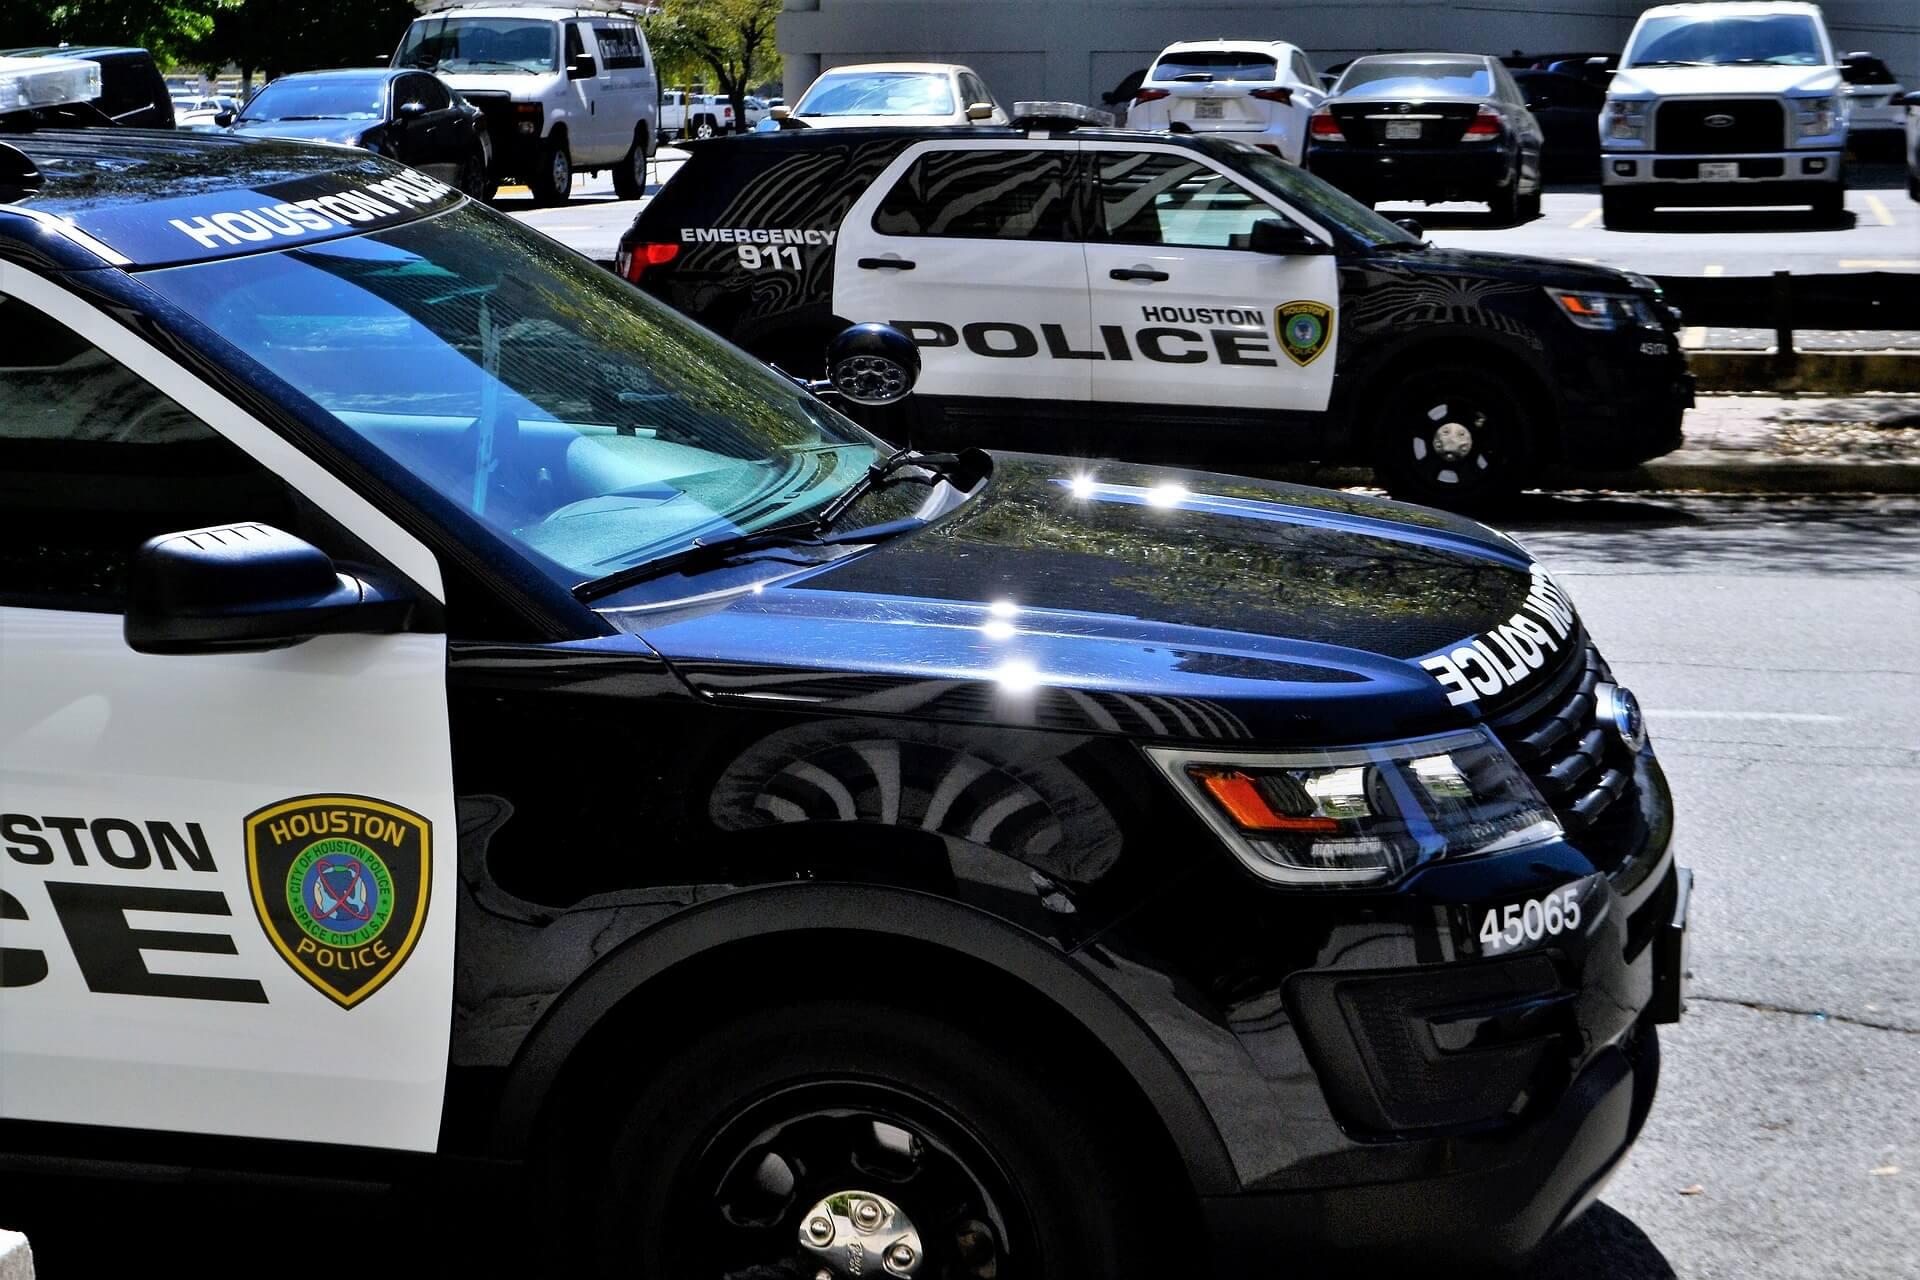 Hit-and-Run Crash Suspect Should Seek Immediate Counsel